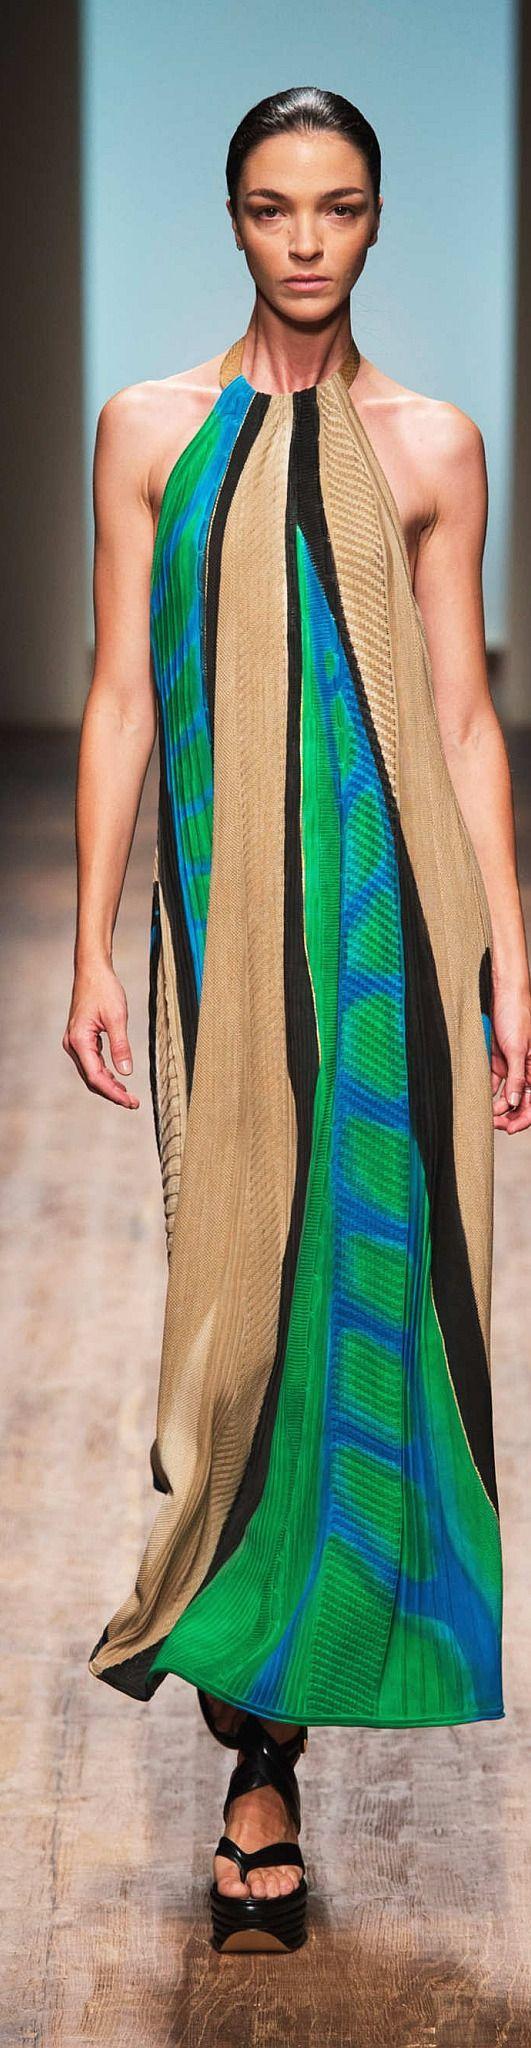 Salvatore Ferragamo Collection Spring 2015 #avenueatet